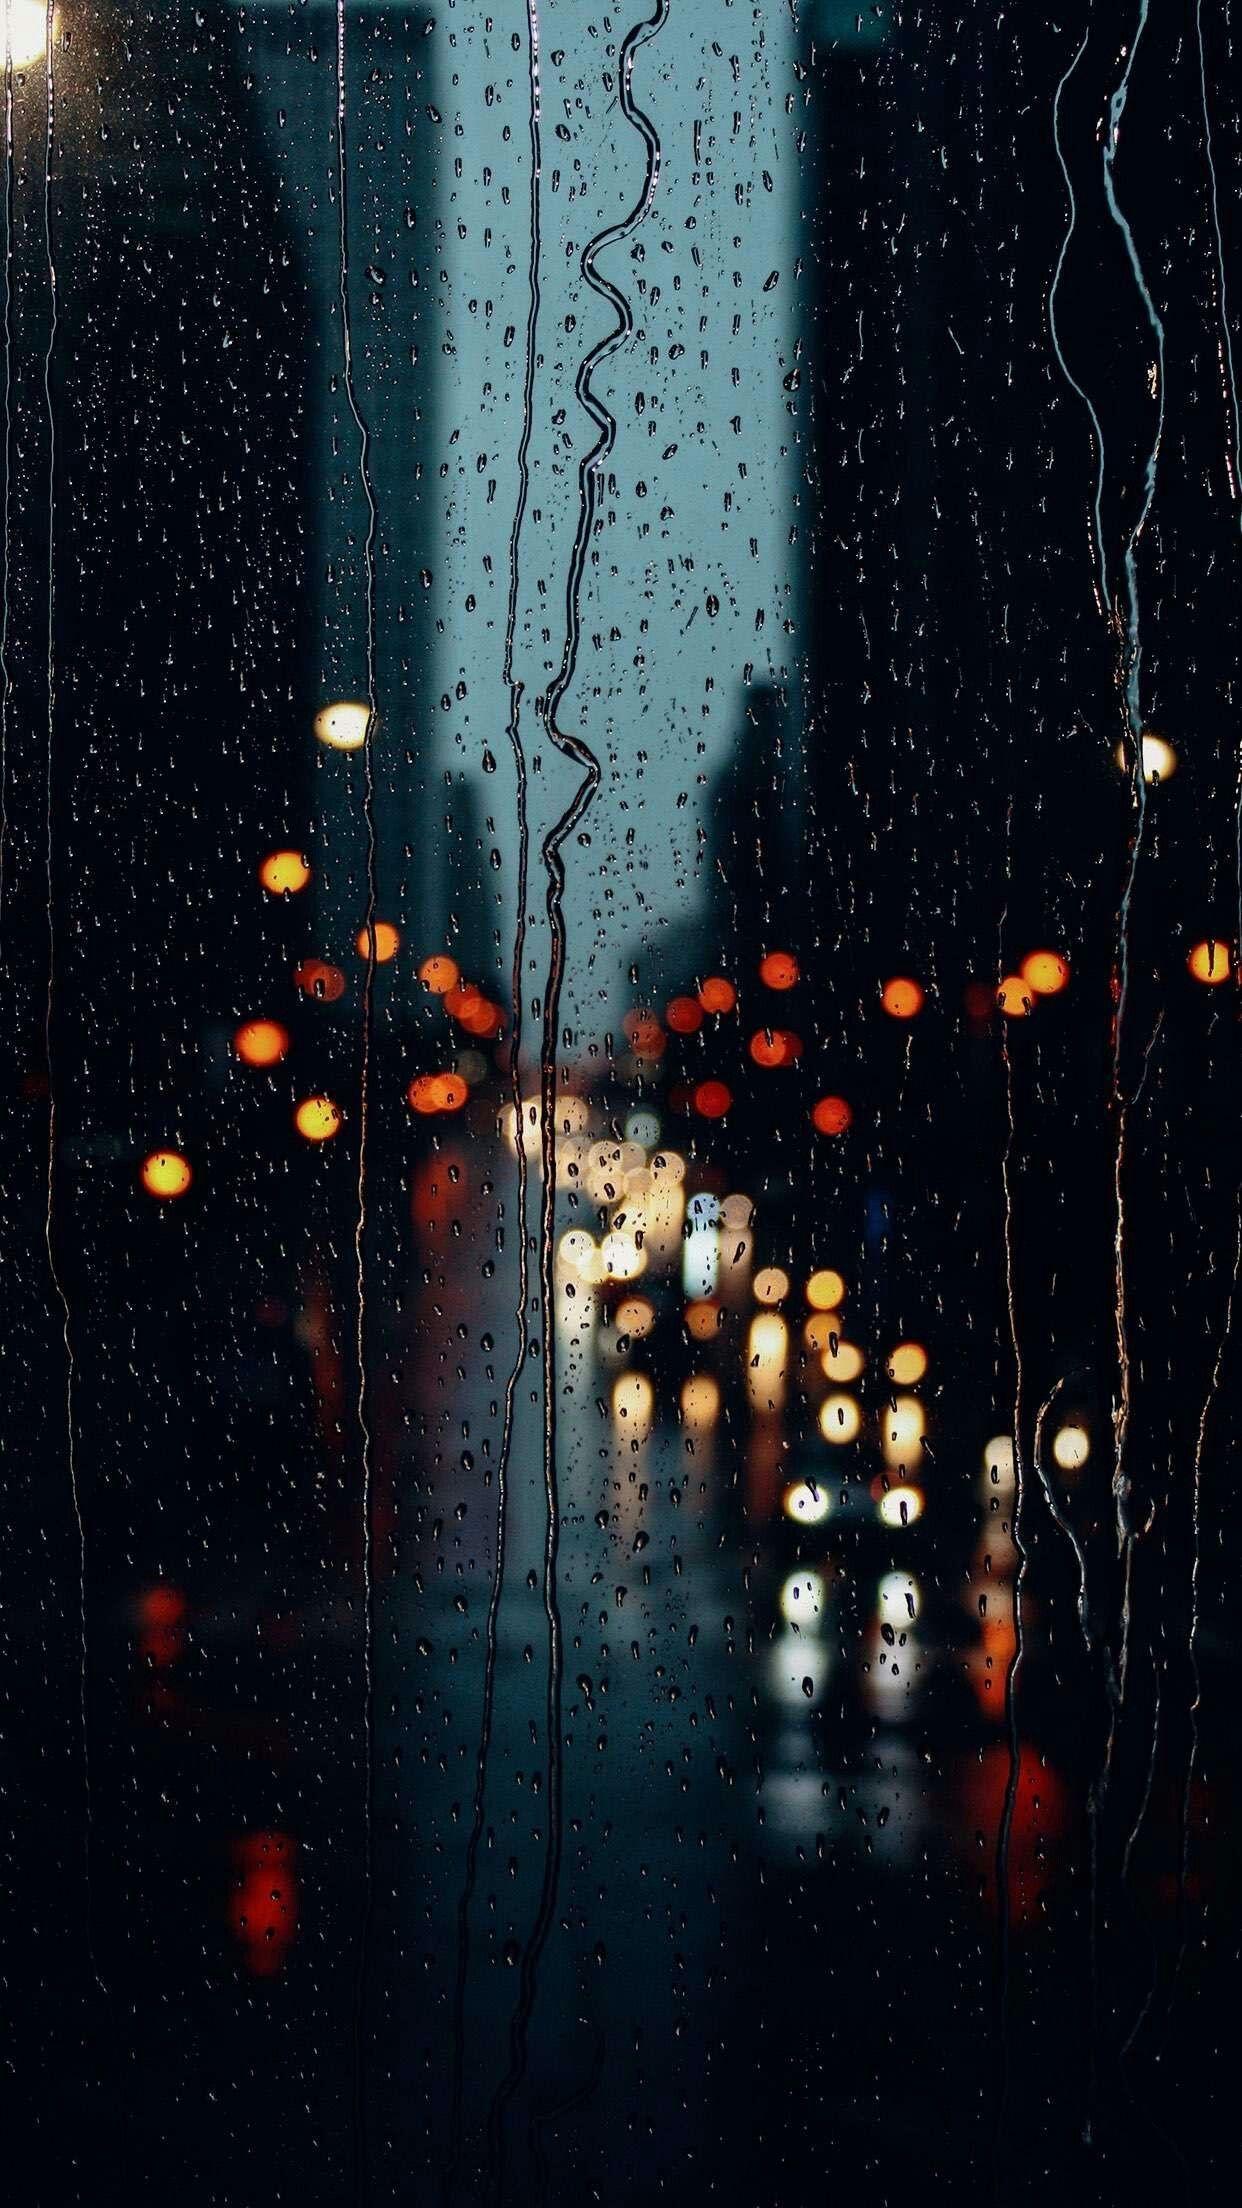 Pin by Iyan Sofyan on Rain in 2019 Rainy wallpaper Rain 1242x2208